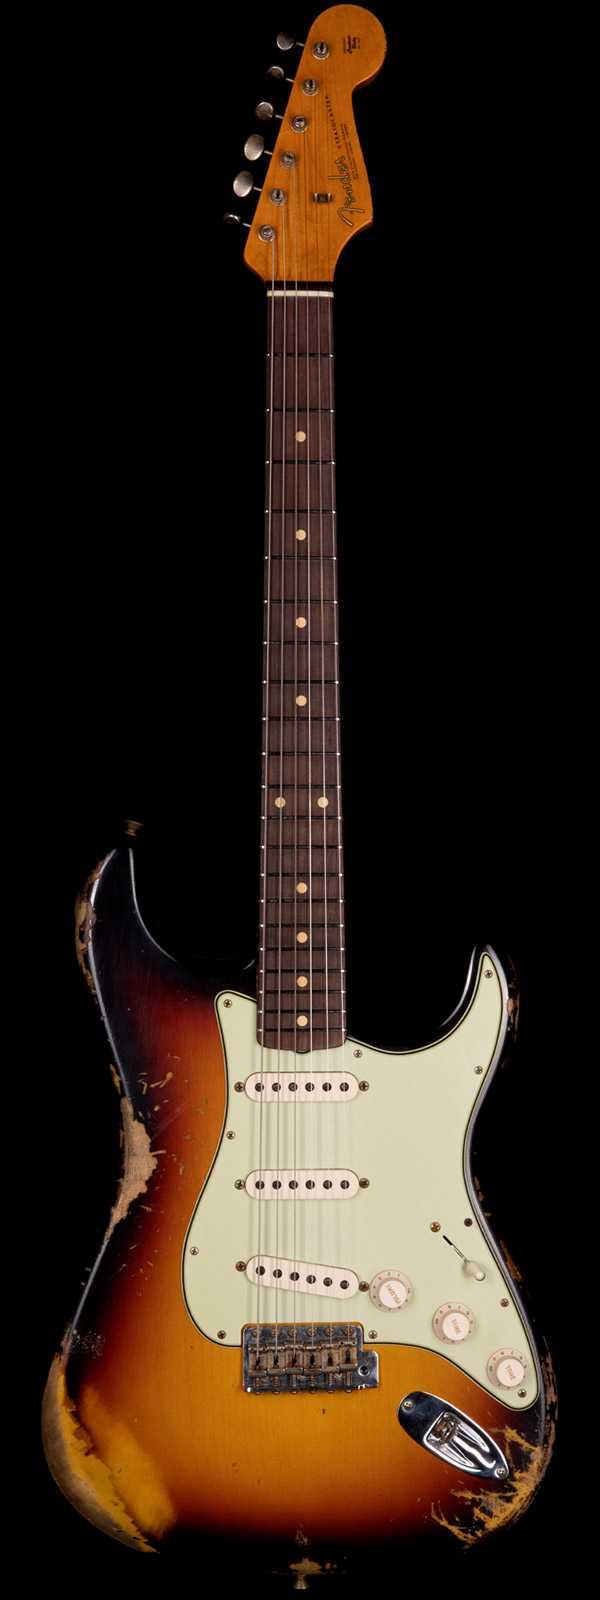 Fender Custom Shop 1963 Stratocaster Heavy Relic 3-Tone Sunburst